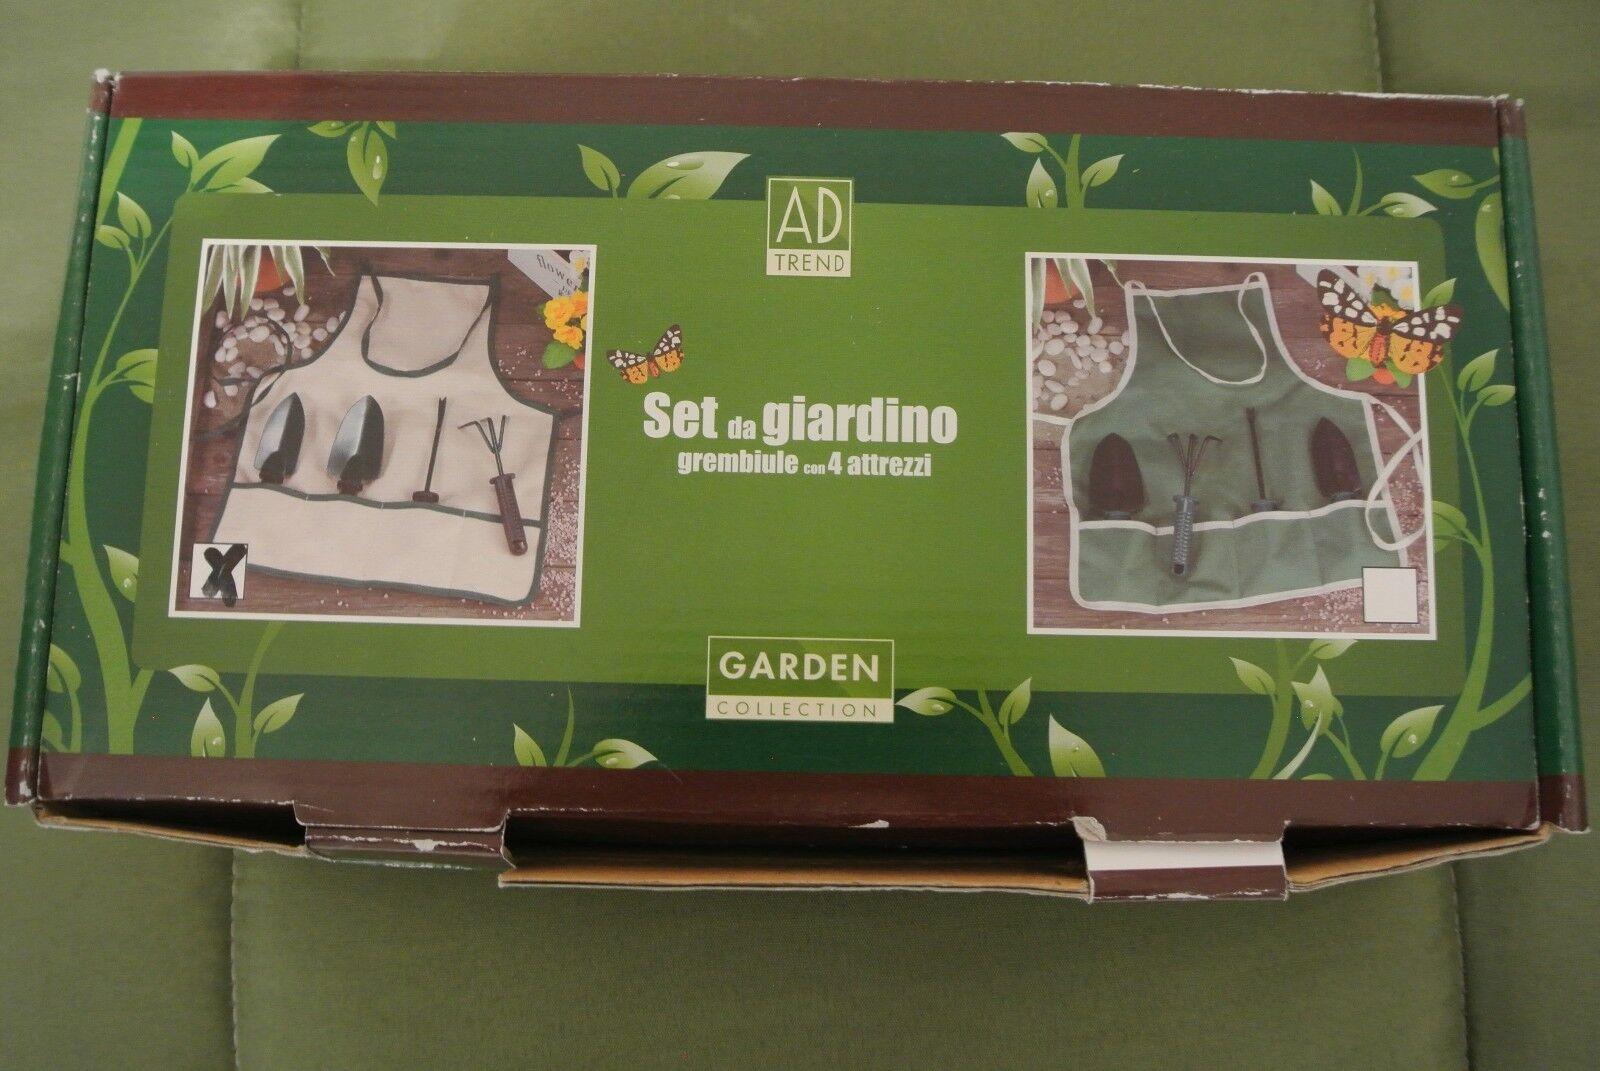 Set attrezzi da giardino grembiule + 4 attrezzi